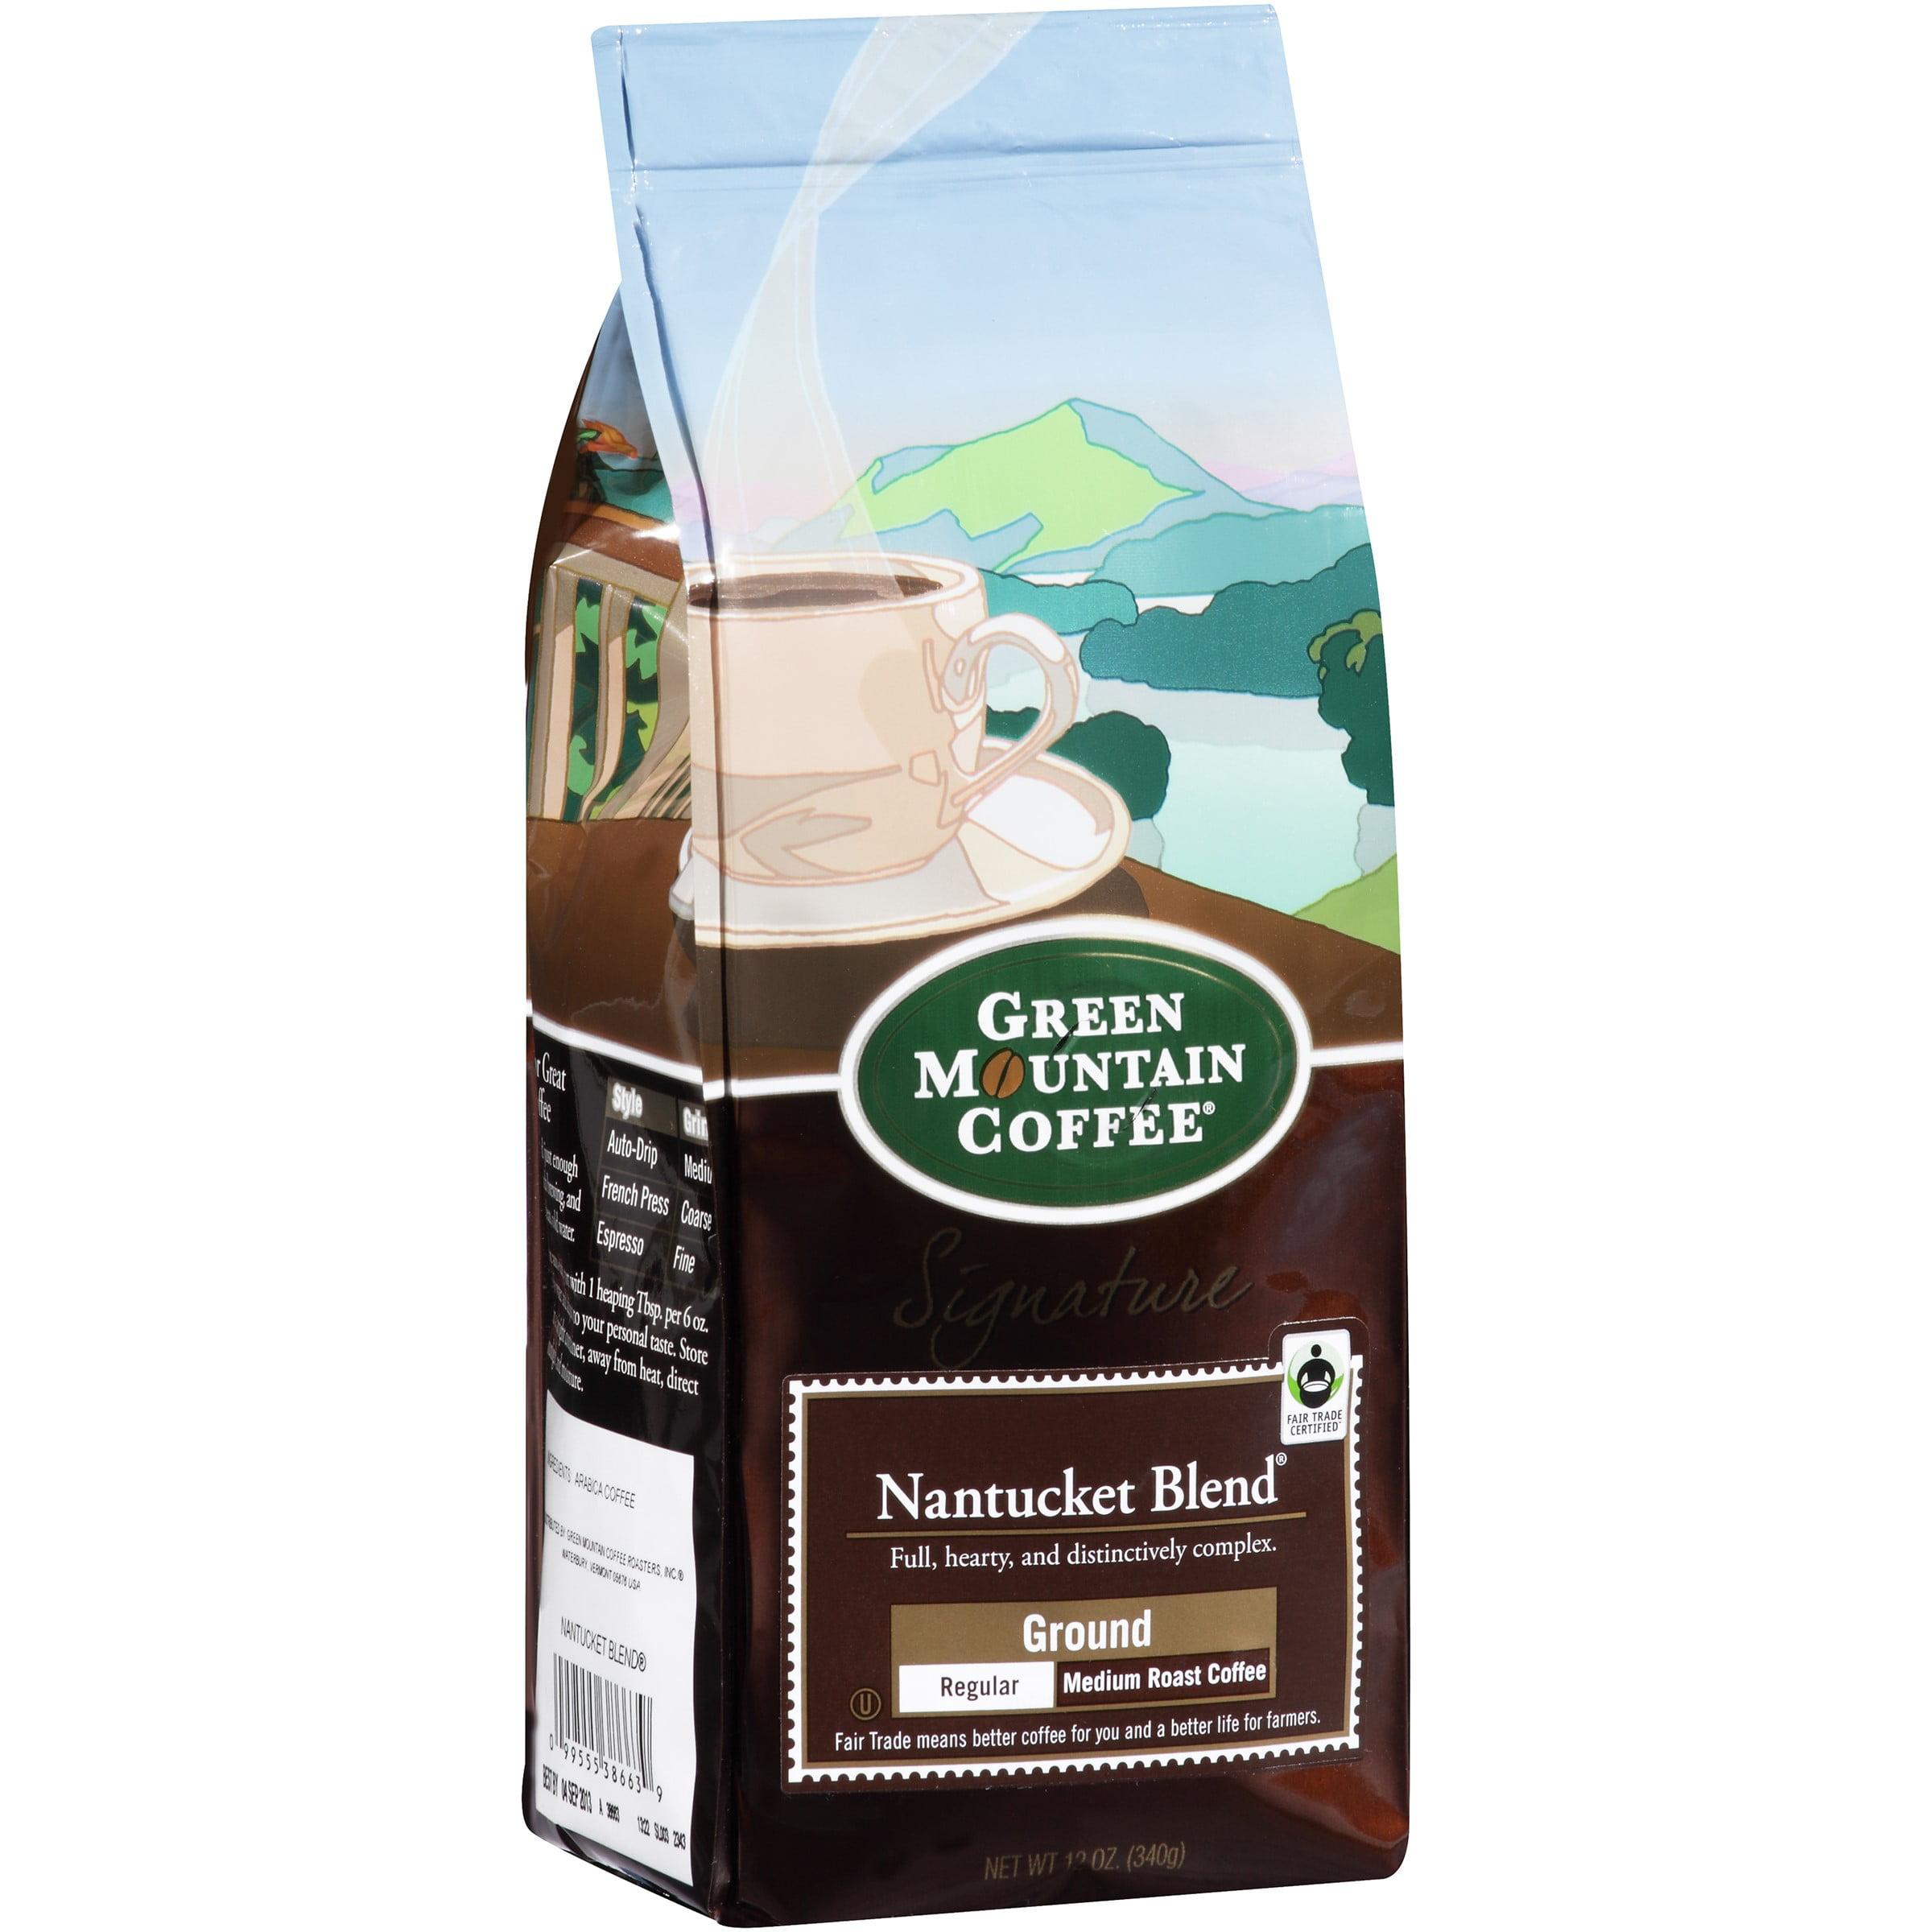 Green Mountain Coffee Signature Nantucket Blend Ground Regular Medium Roast Coffee 12 Oz. Bag